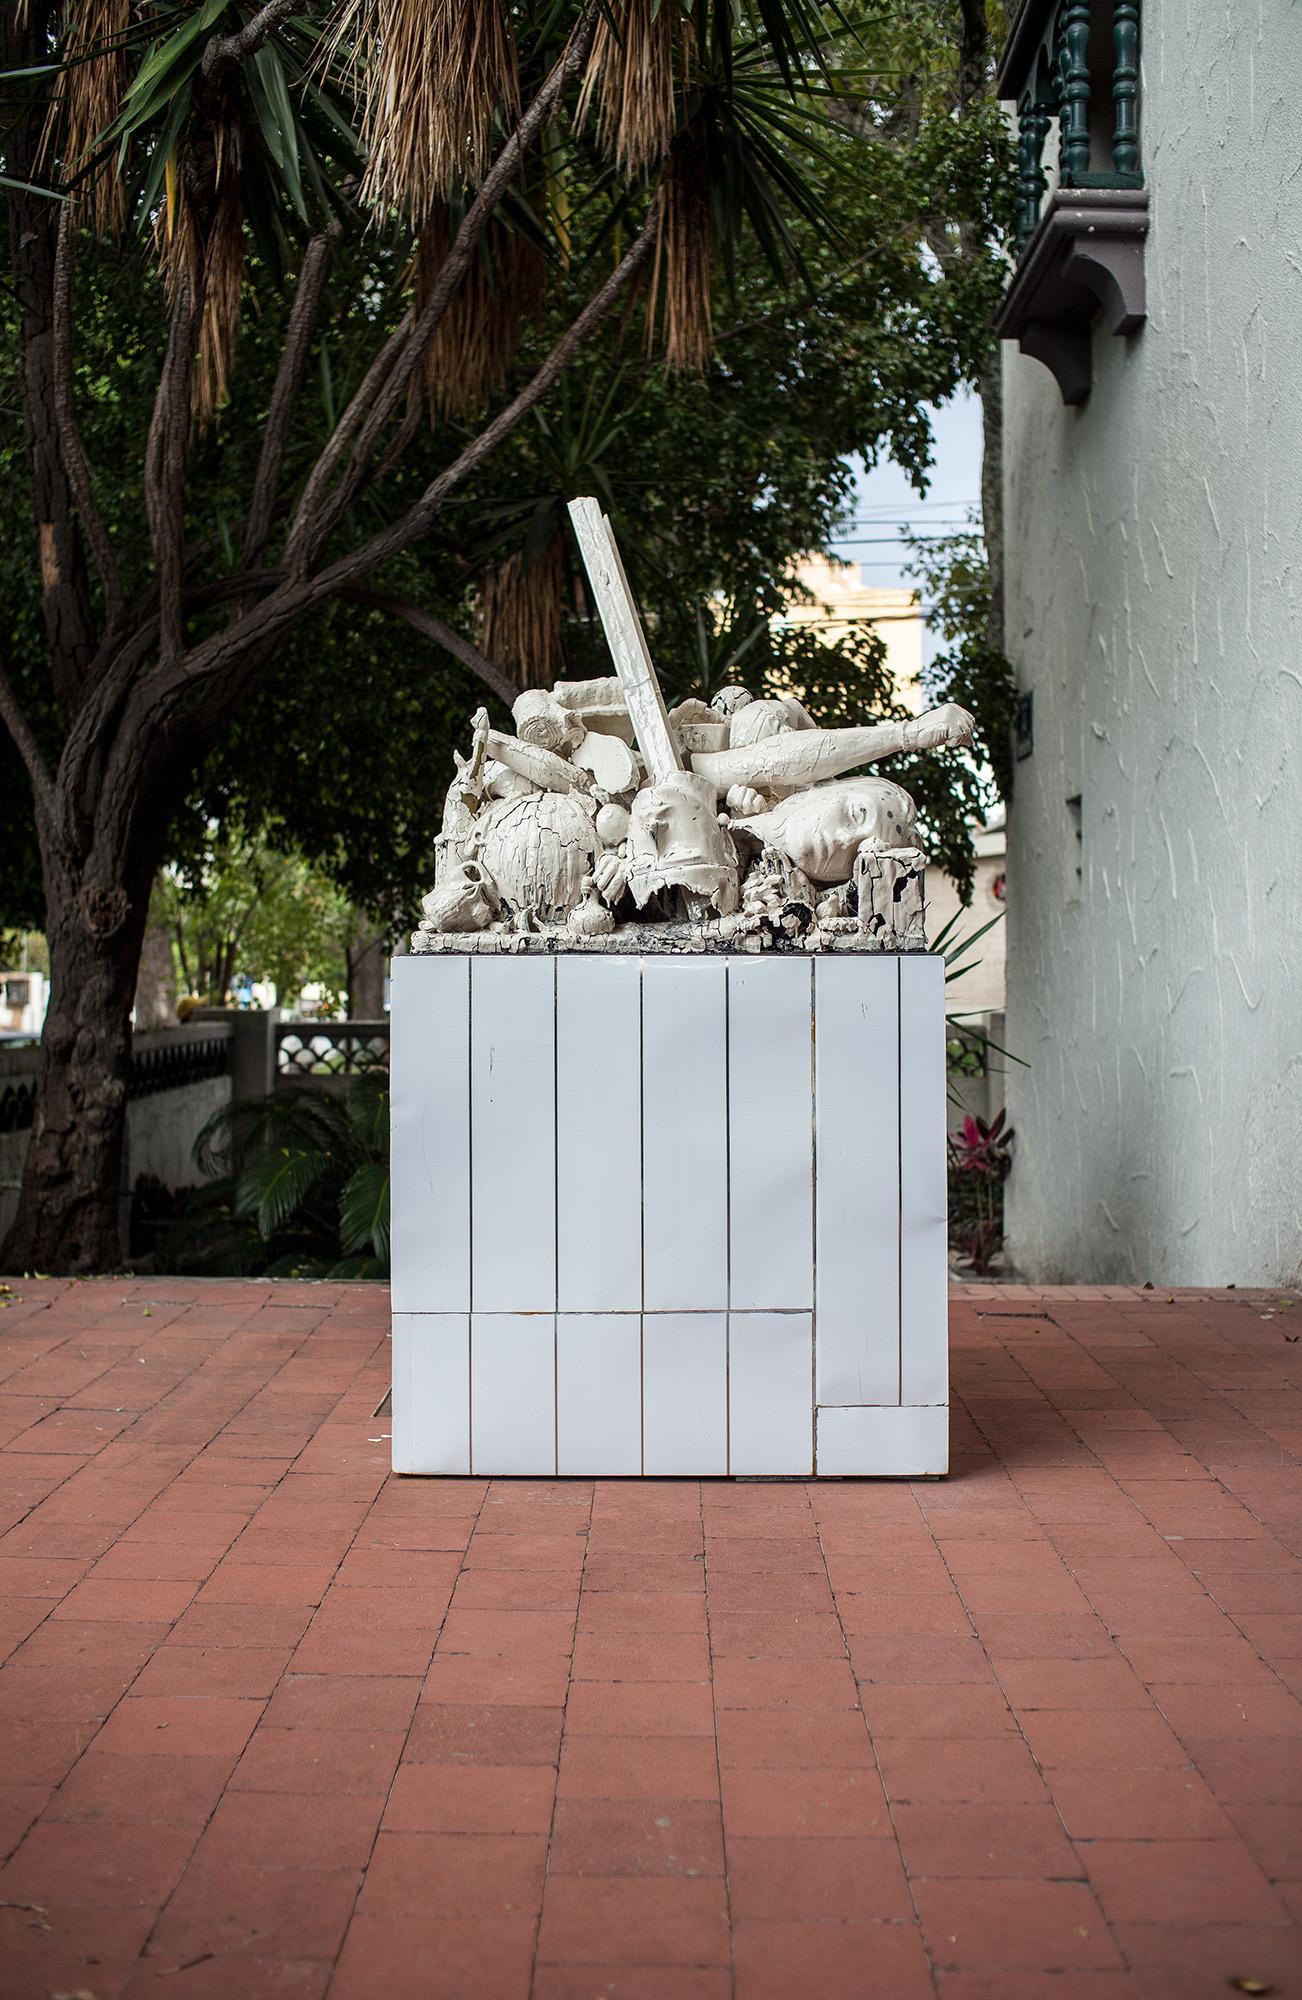 Los Payasos (February 17 – August 28, 2015: Cerámica Suro Contemporánea, Guadalajara, Jalisco, Mexico)    2015   Ceramica Suro slip cast remnants, glaze, and firing plate  77 1/2 x 46 x 27 1/4 inches   Disponibles, 2015